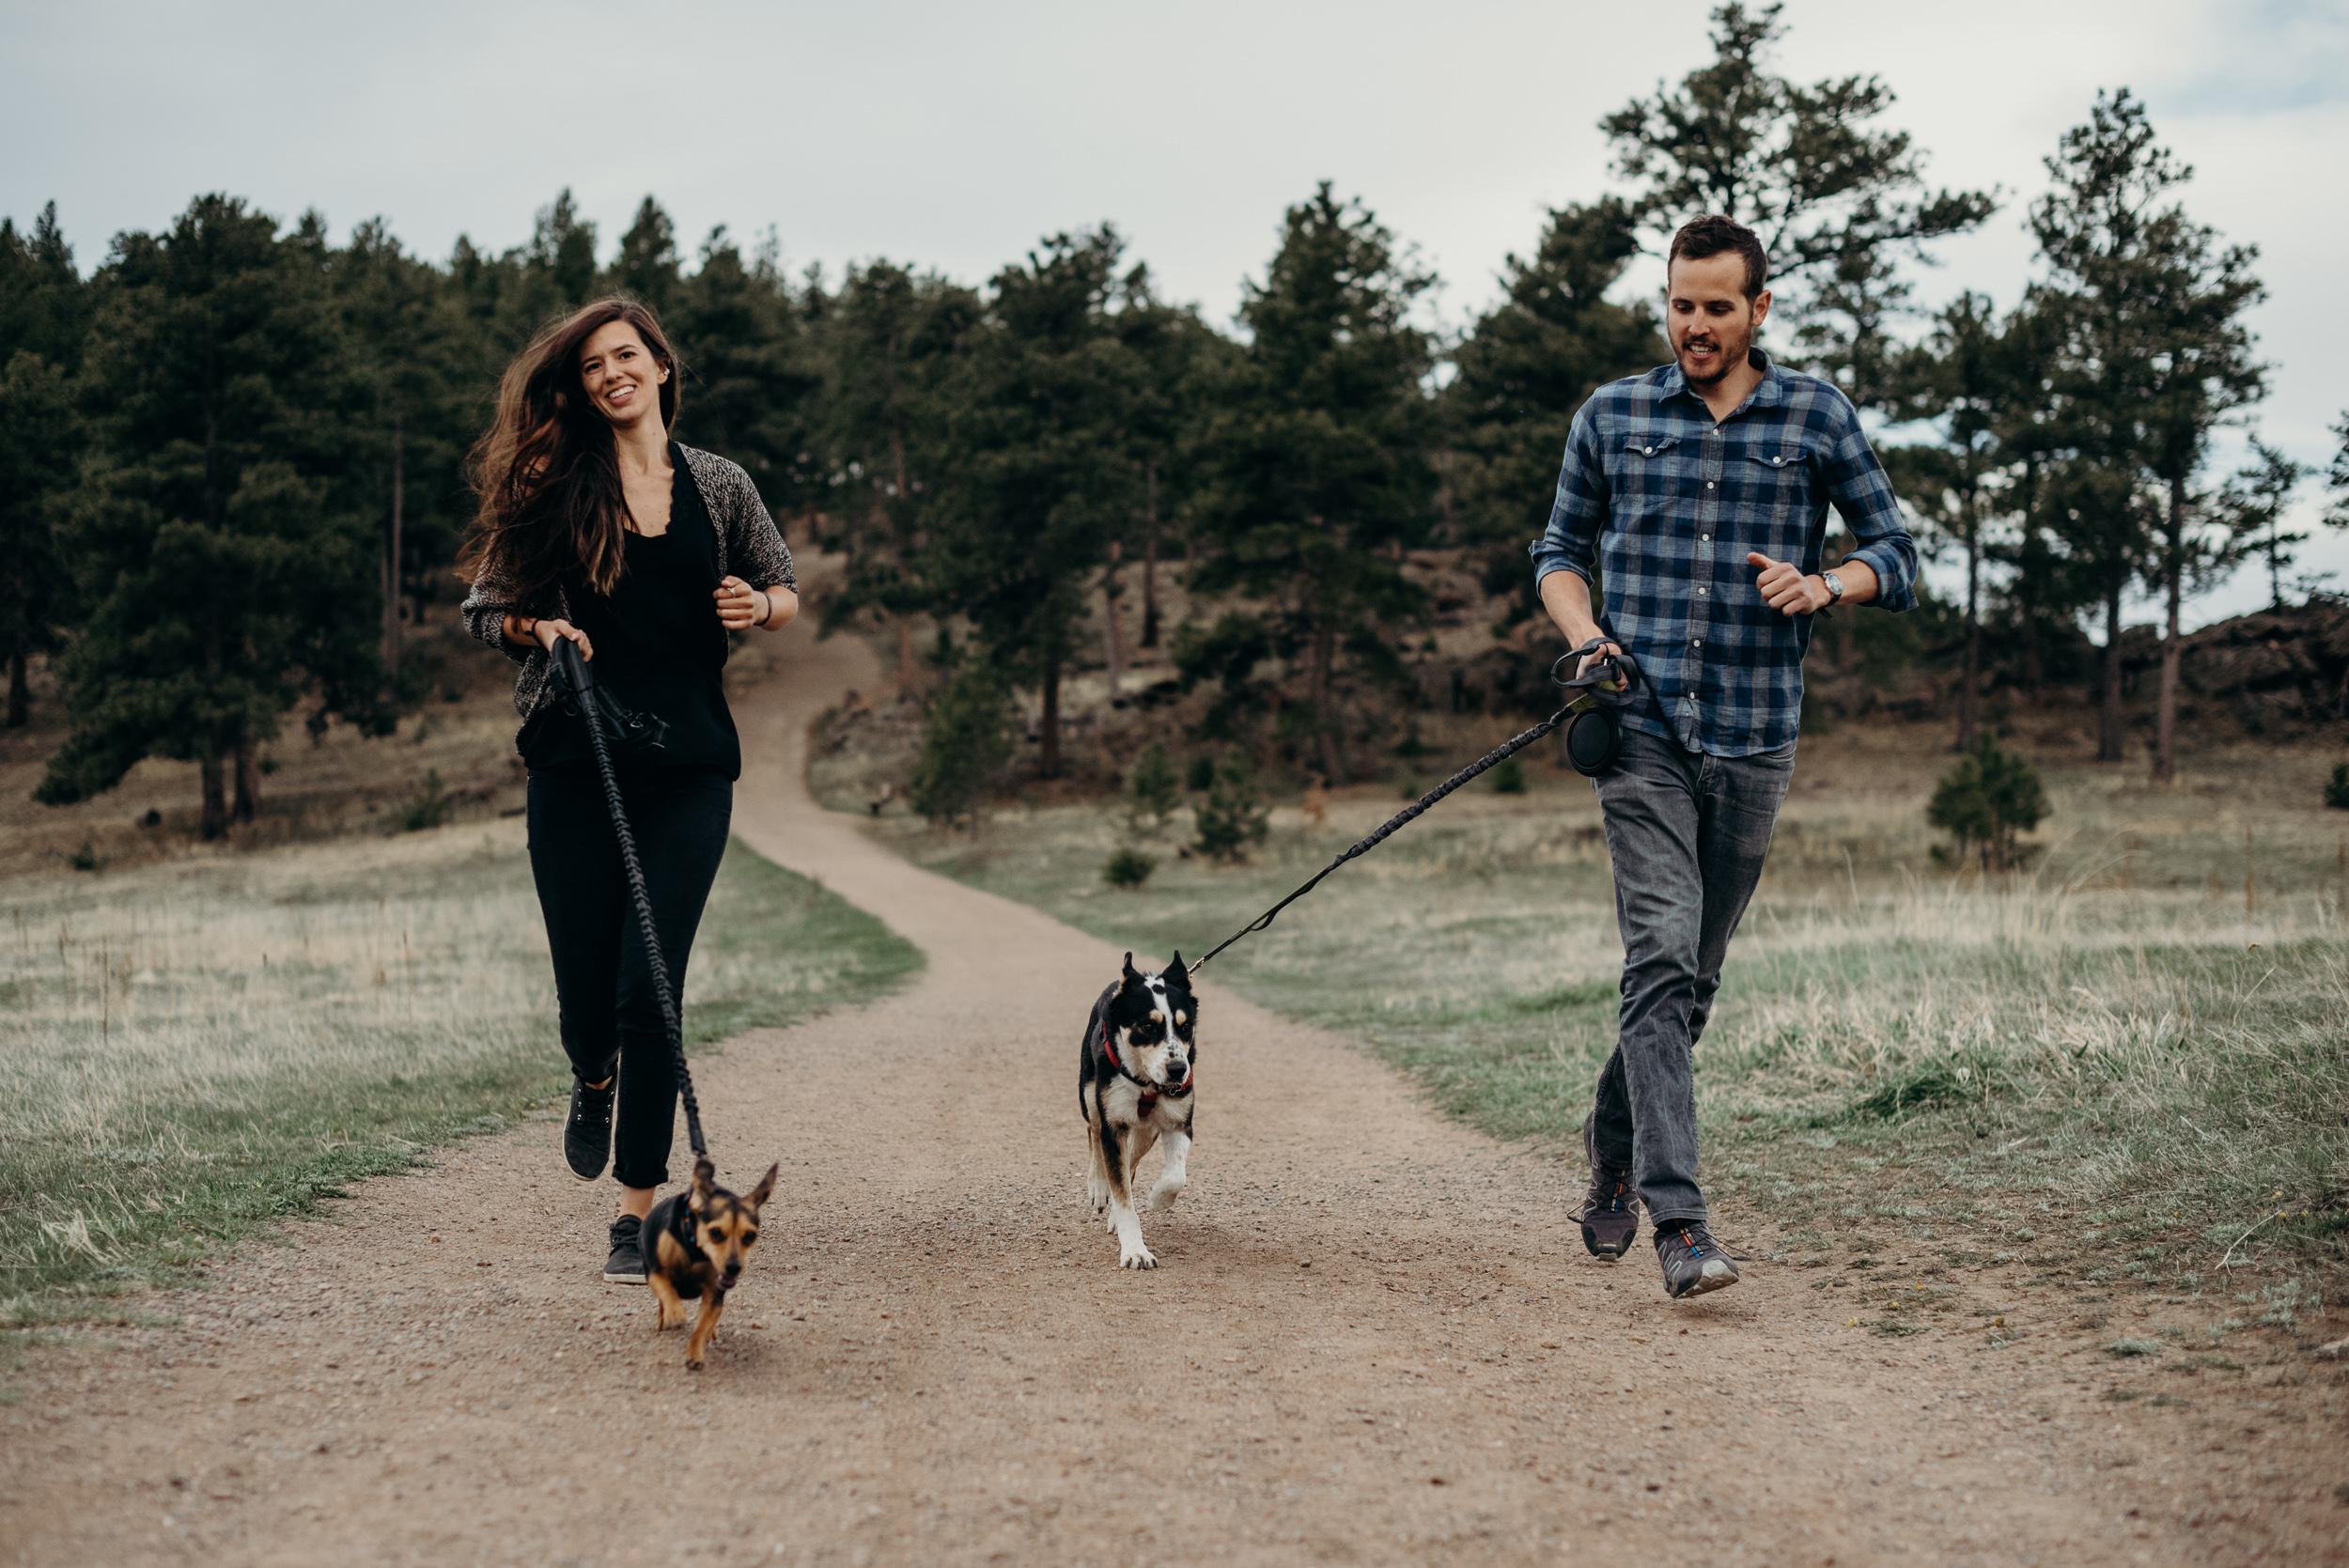 Denver-Colorado-Mt-Falcon-Engagement-Megan-Graham-Photography-7132.jpg